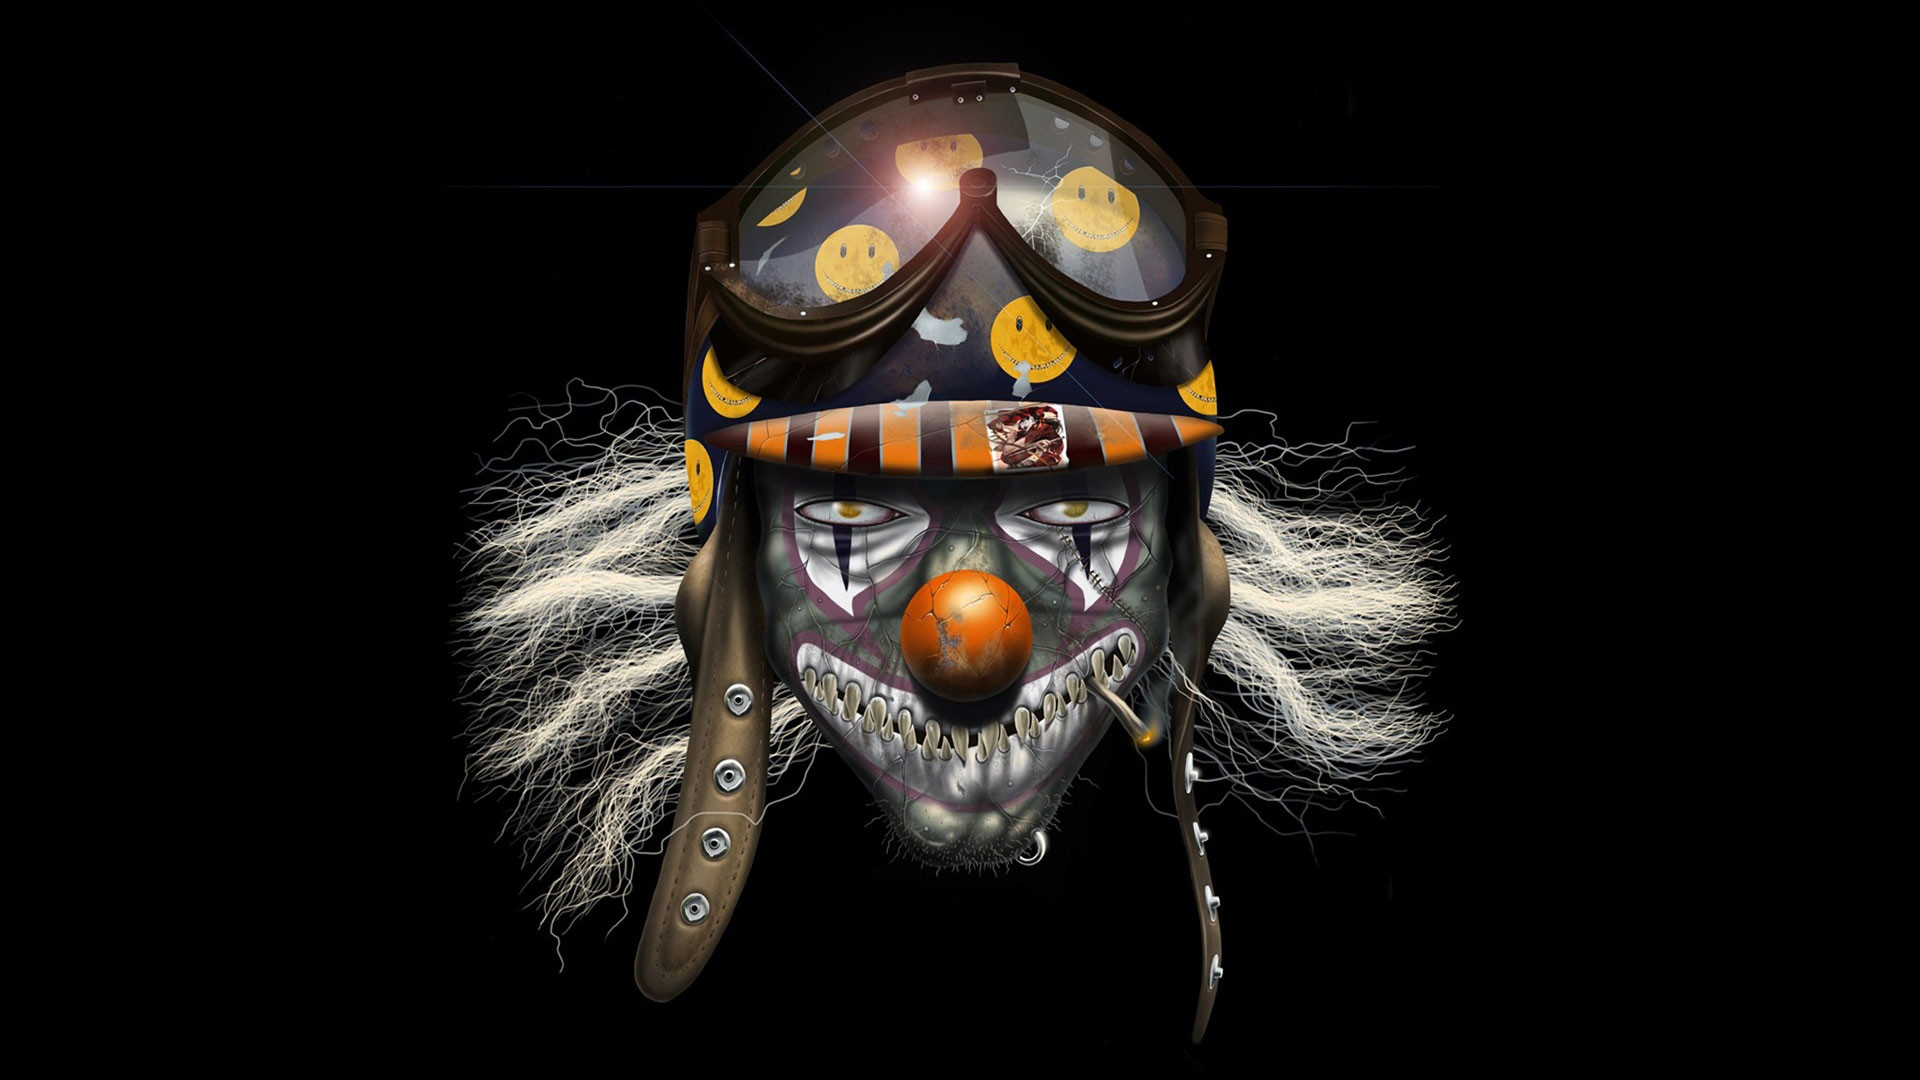 hd pics photos face masks designs skull danger hd quality desktop  background wallpaper